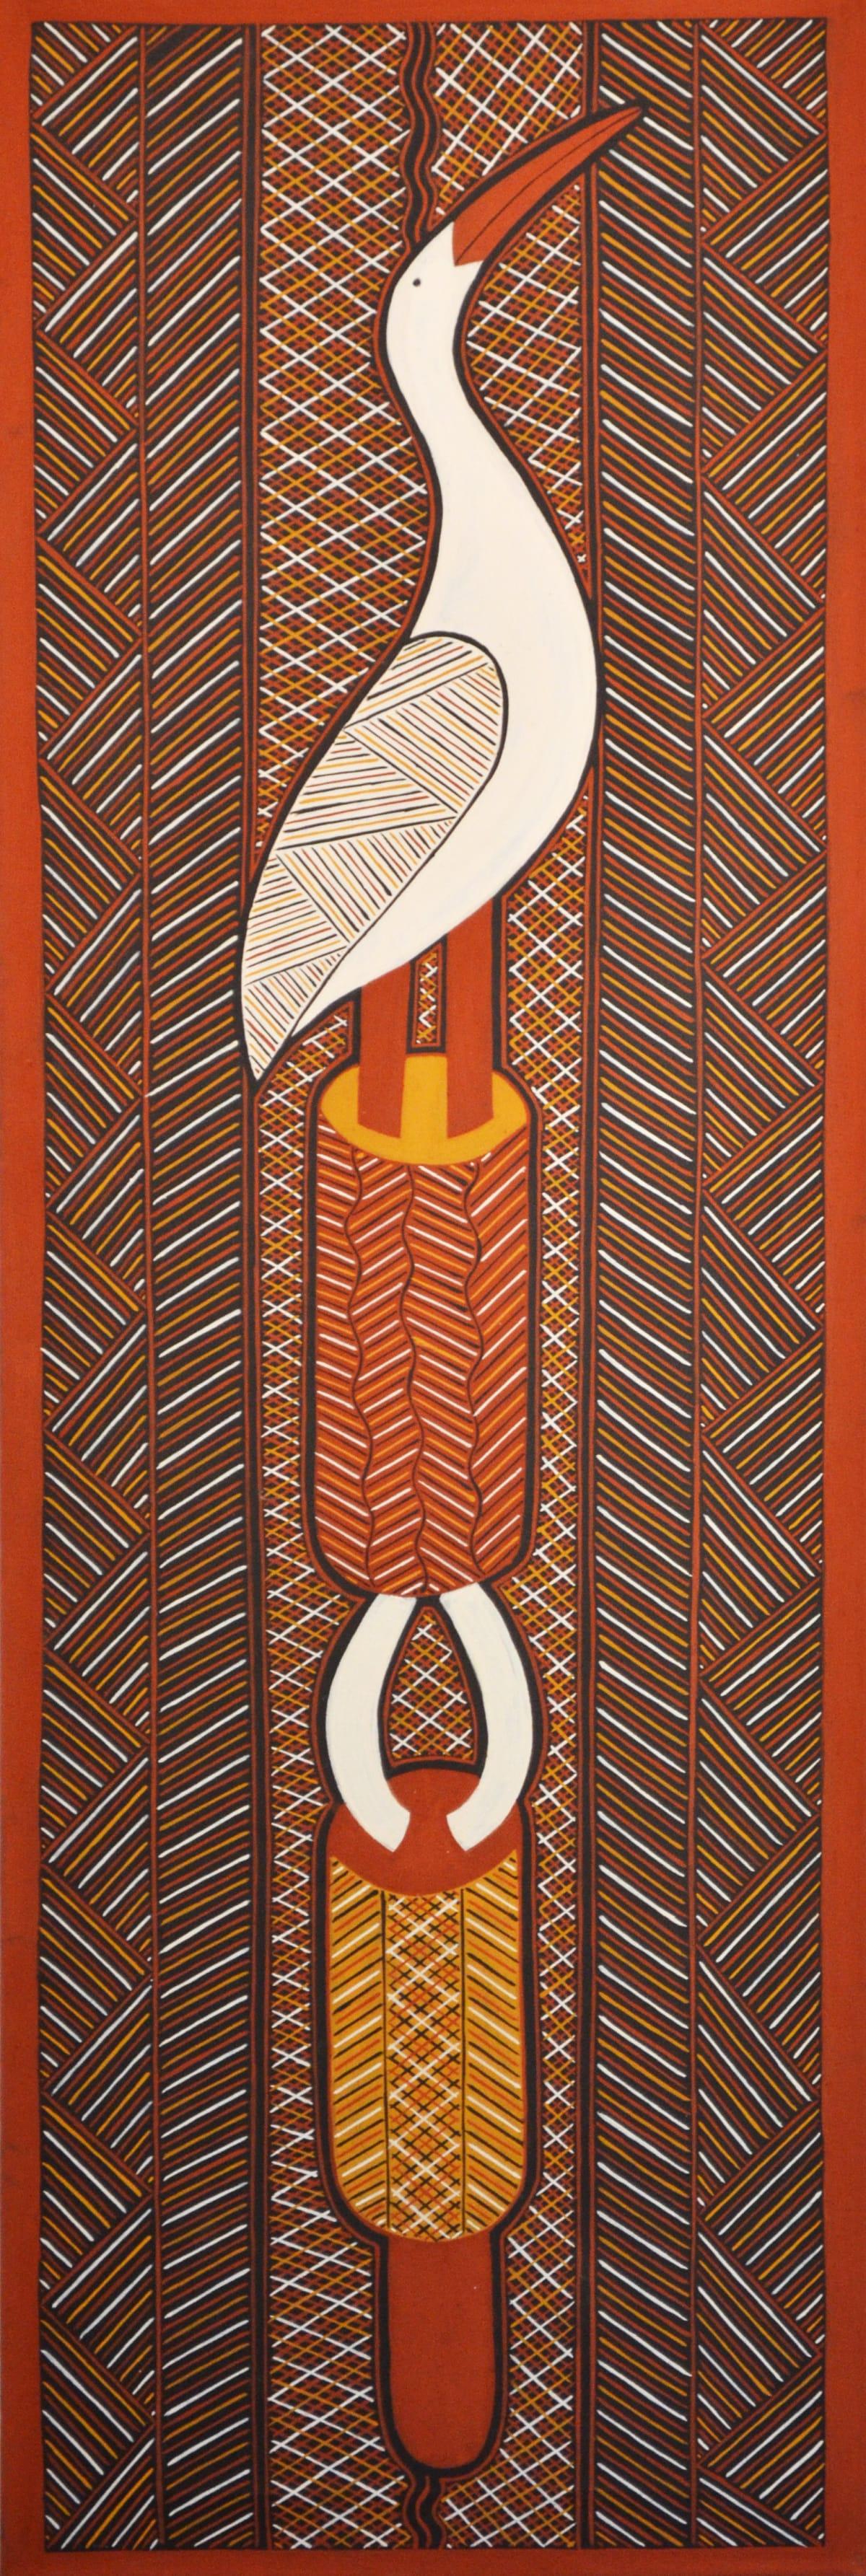 Nicholas Mario Untitled natural ochres on canvas 180 x 60 cm